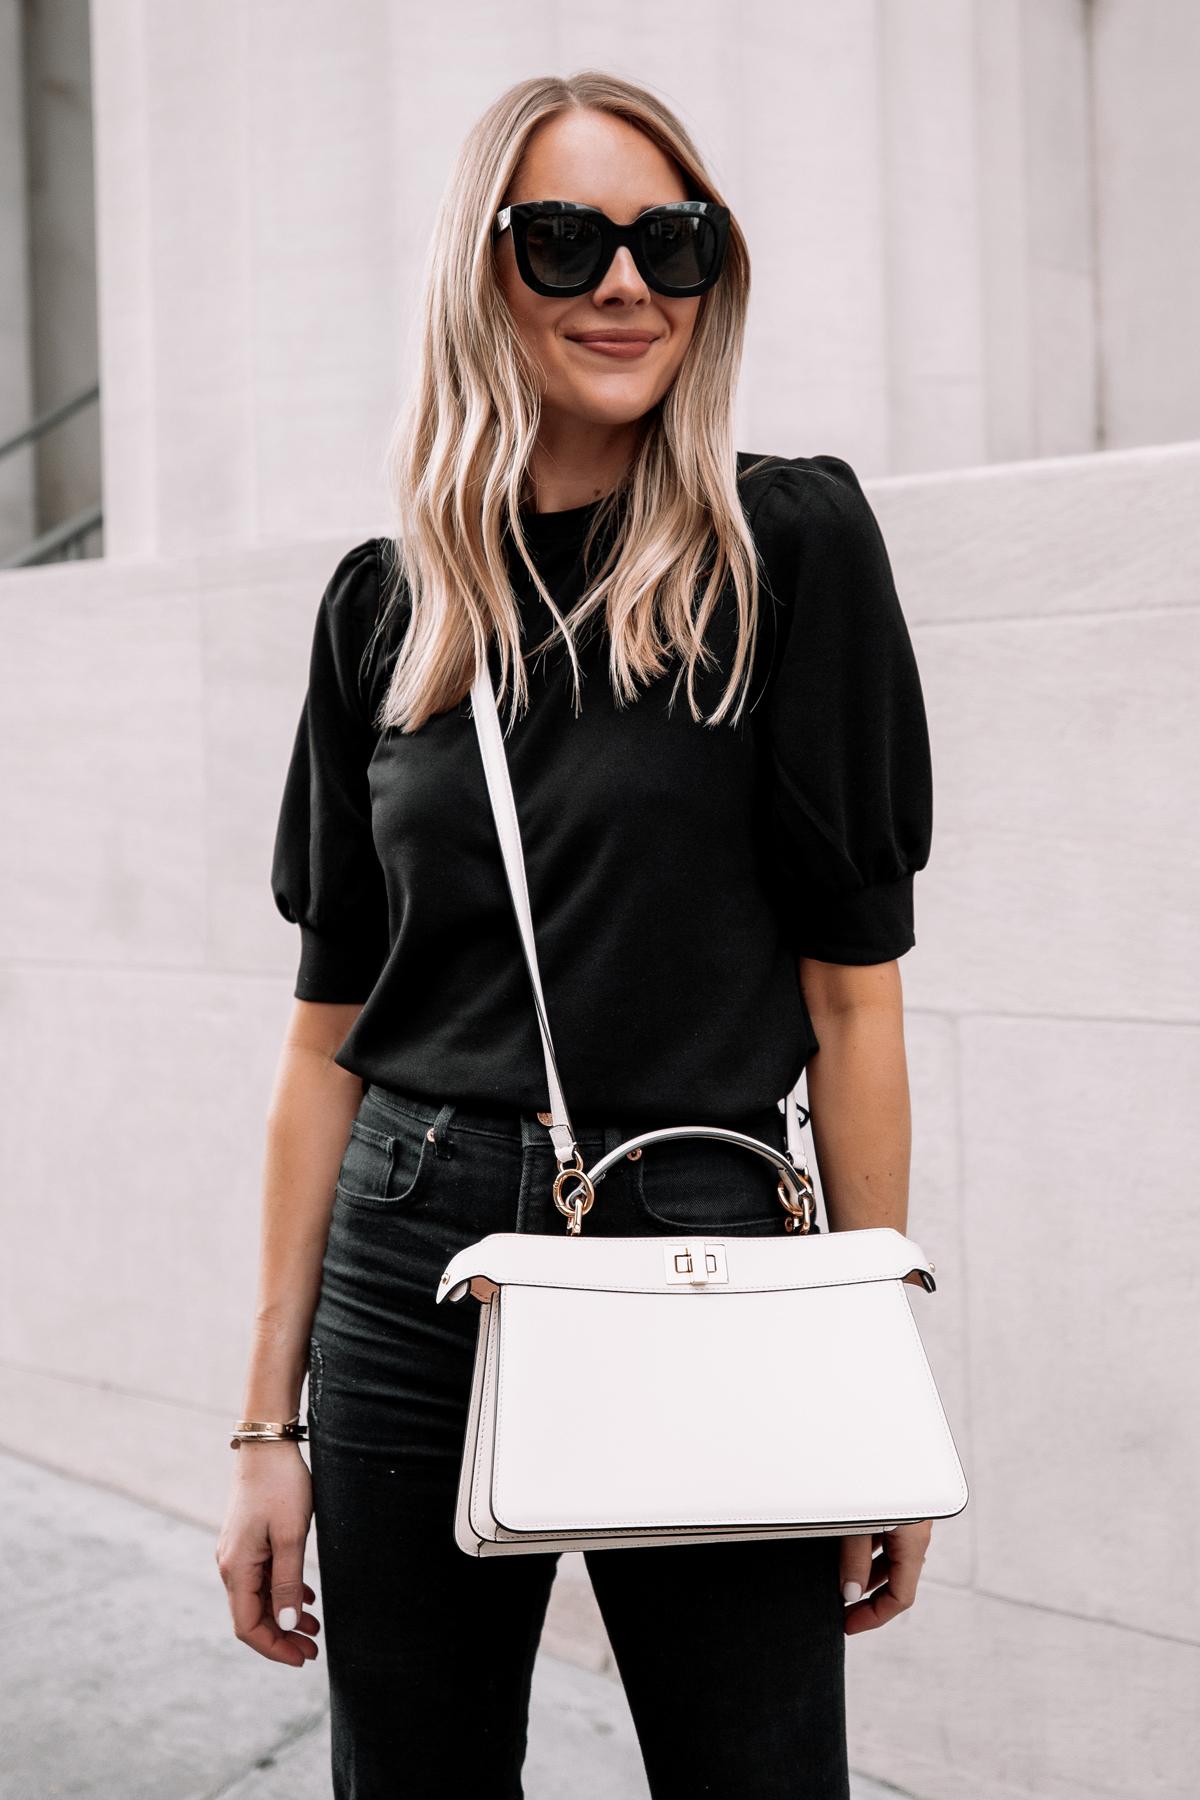 Fashion Jackson Wearing Black Puff Sleeve Top Black Jeans Fendi White Peekaboo Handbag